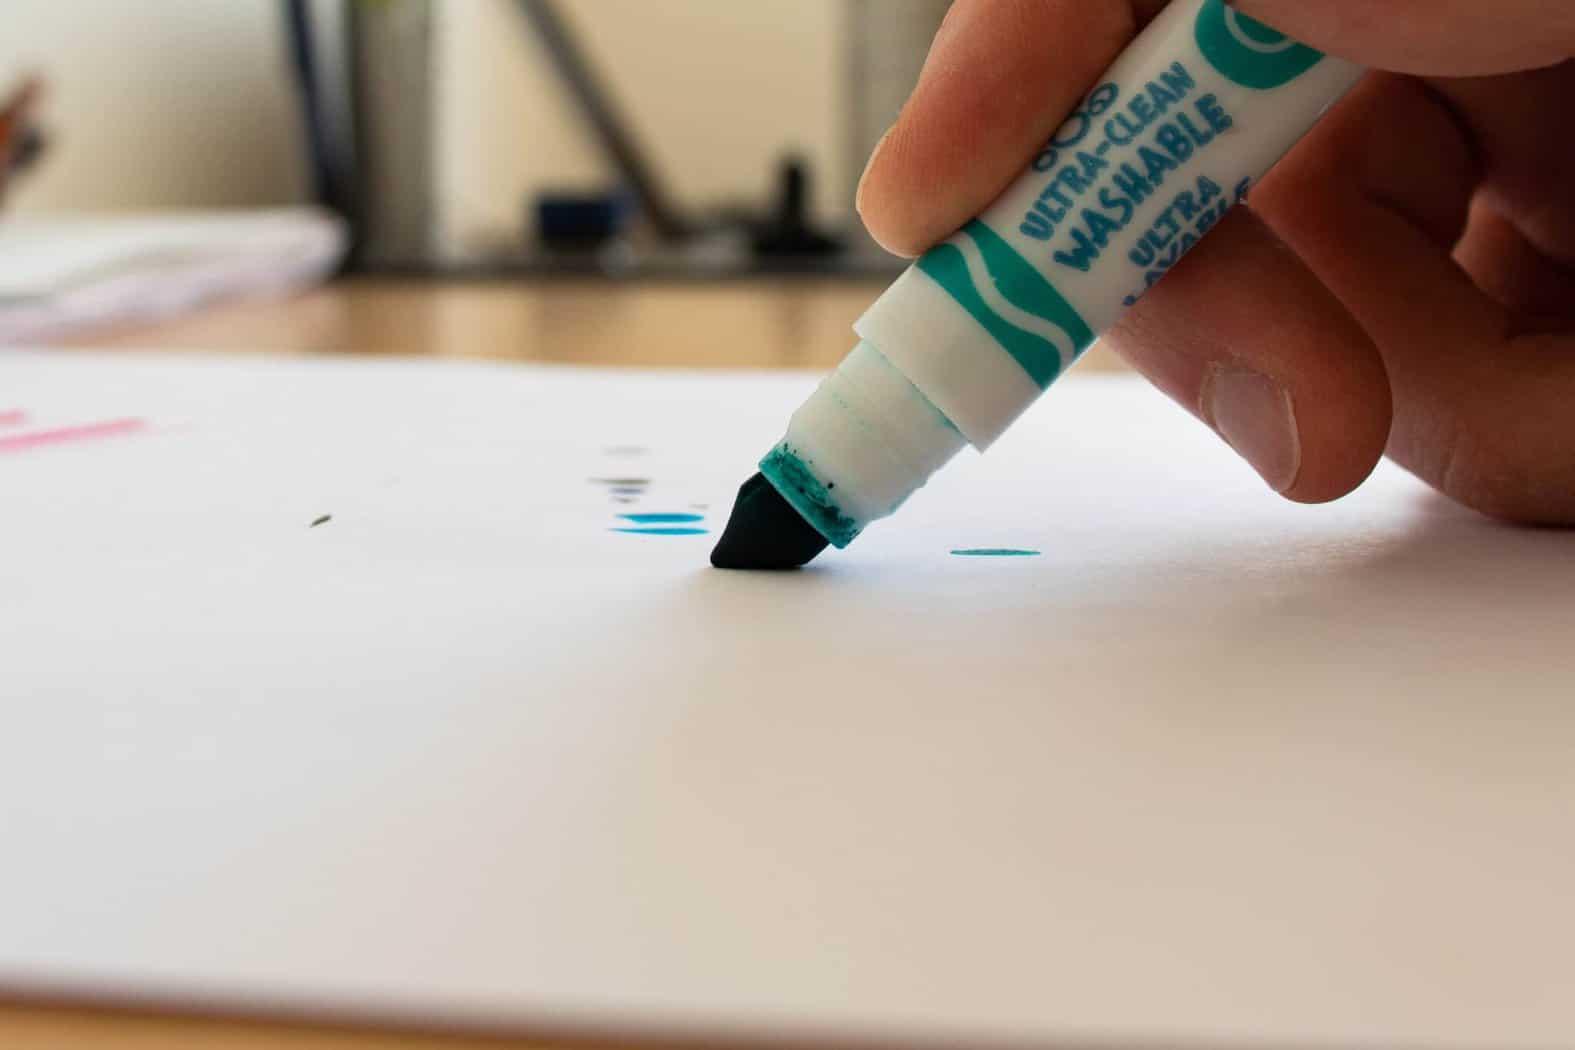 nib elasticity sample - Crayola Marker